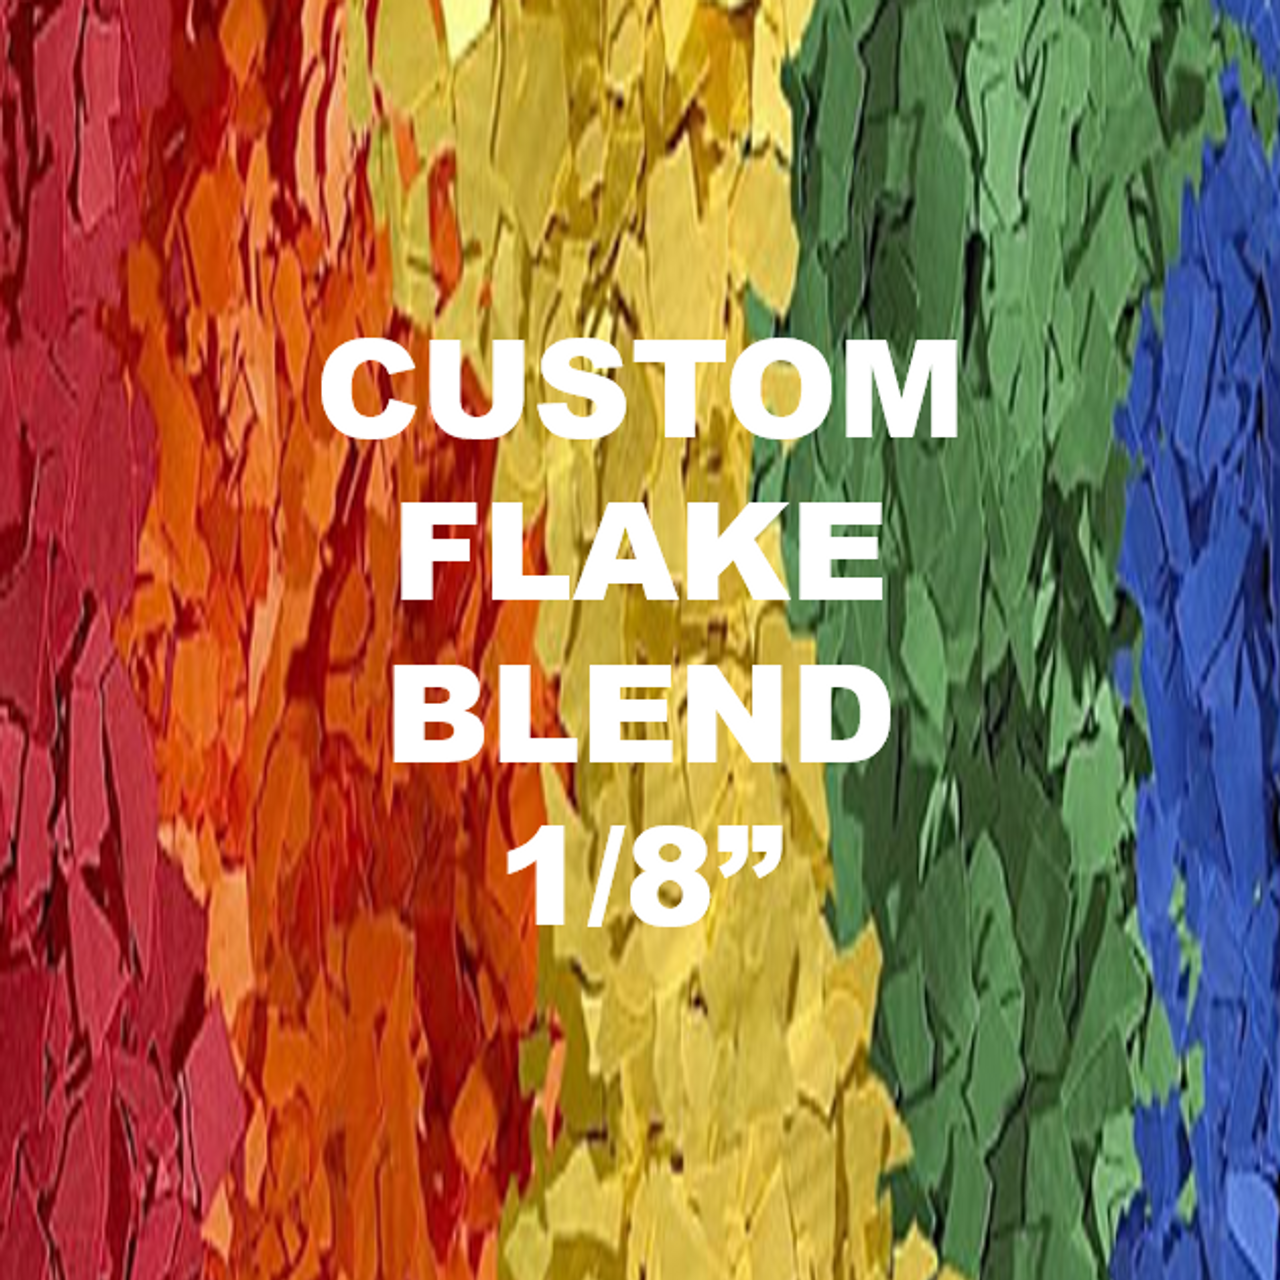 "1/32"", 1/16"", or 1/8"" Custom Blended Flake (per lb.)  SHIPS FROM TORGINOL"